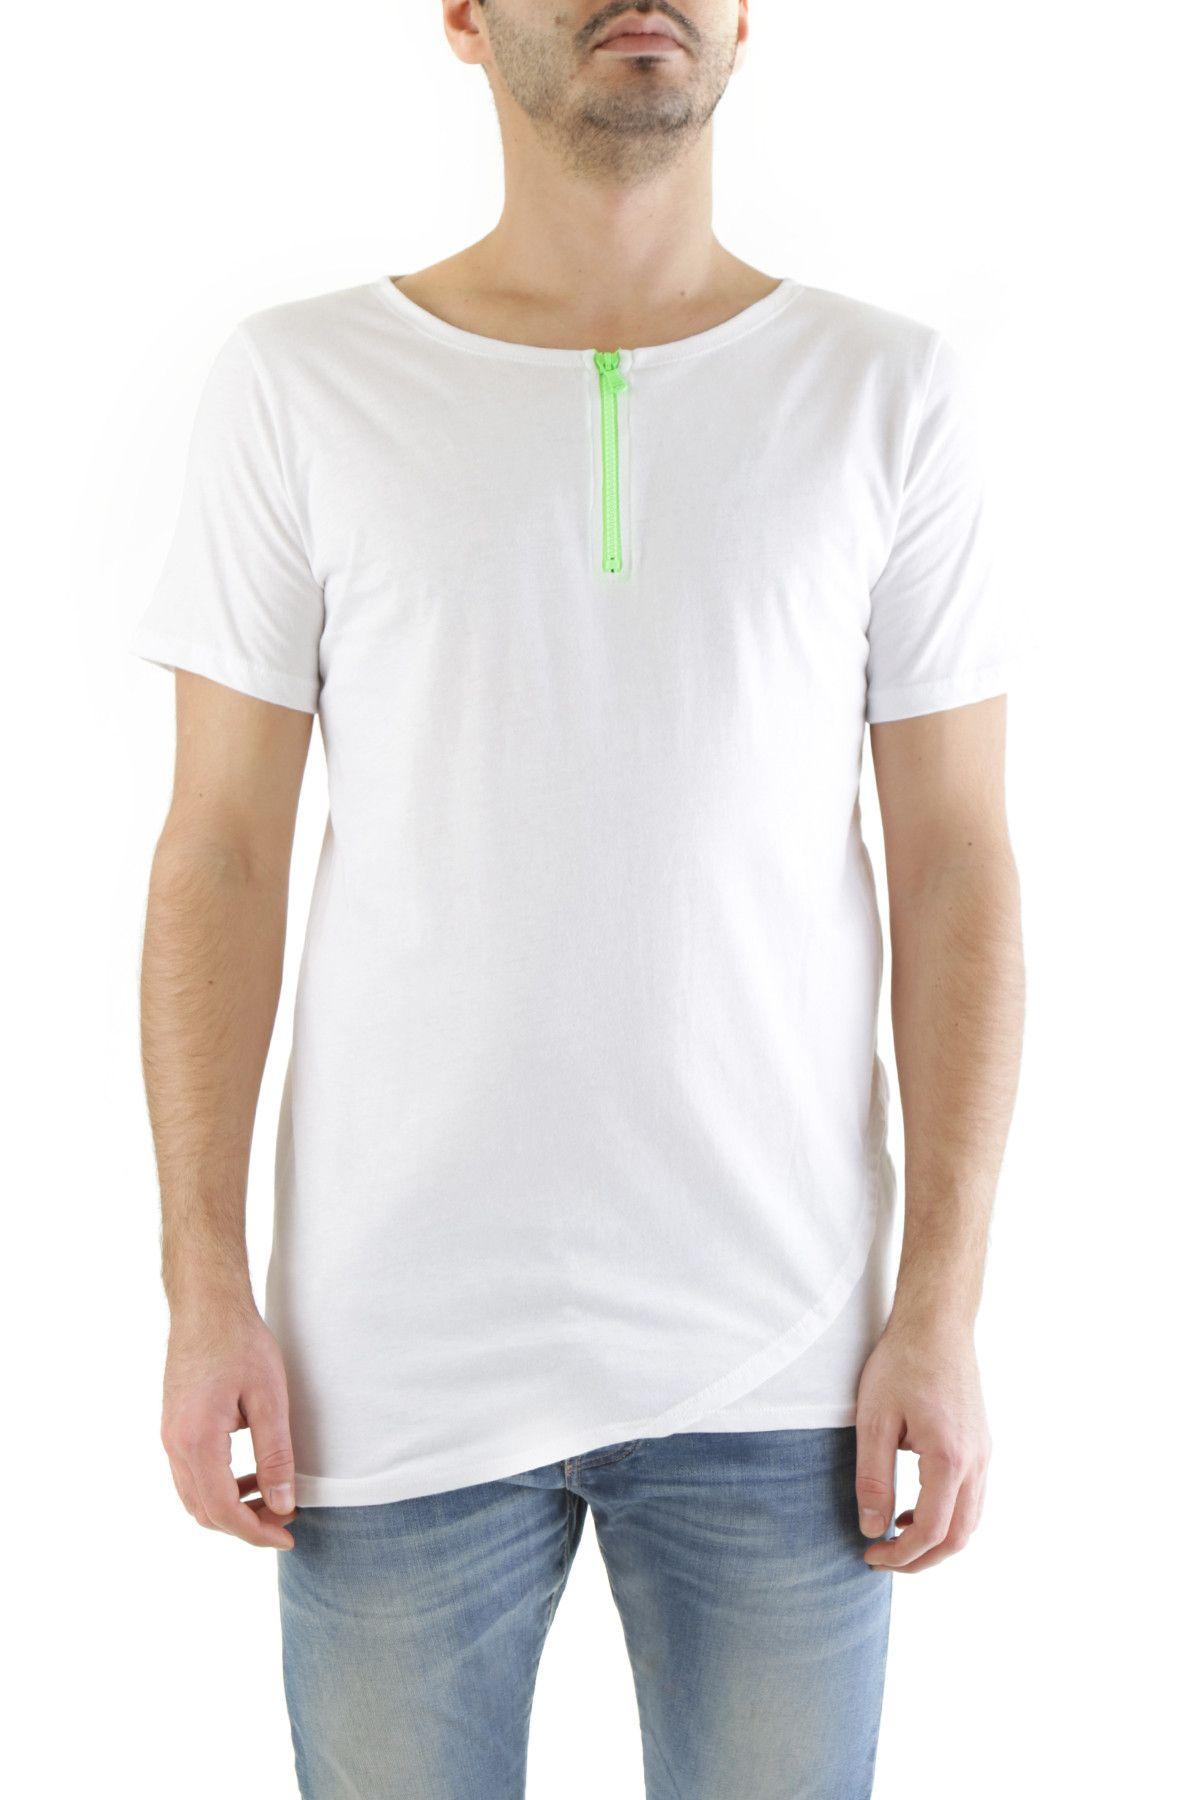 525 Men's Sweatshirt In White